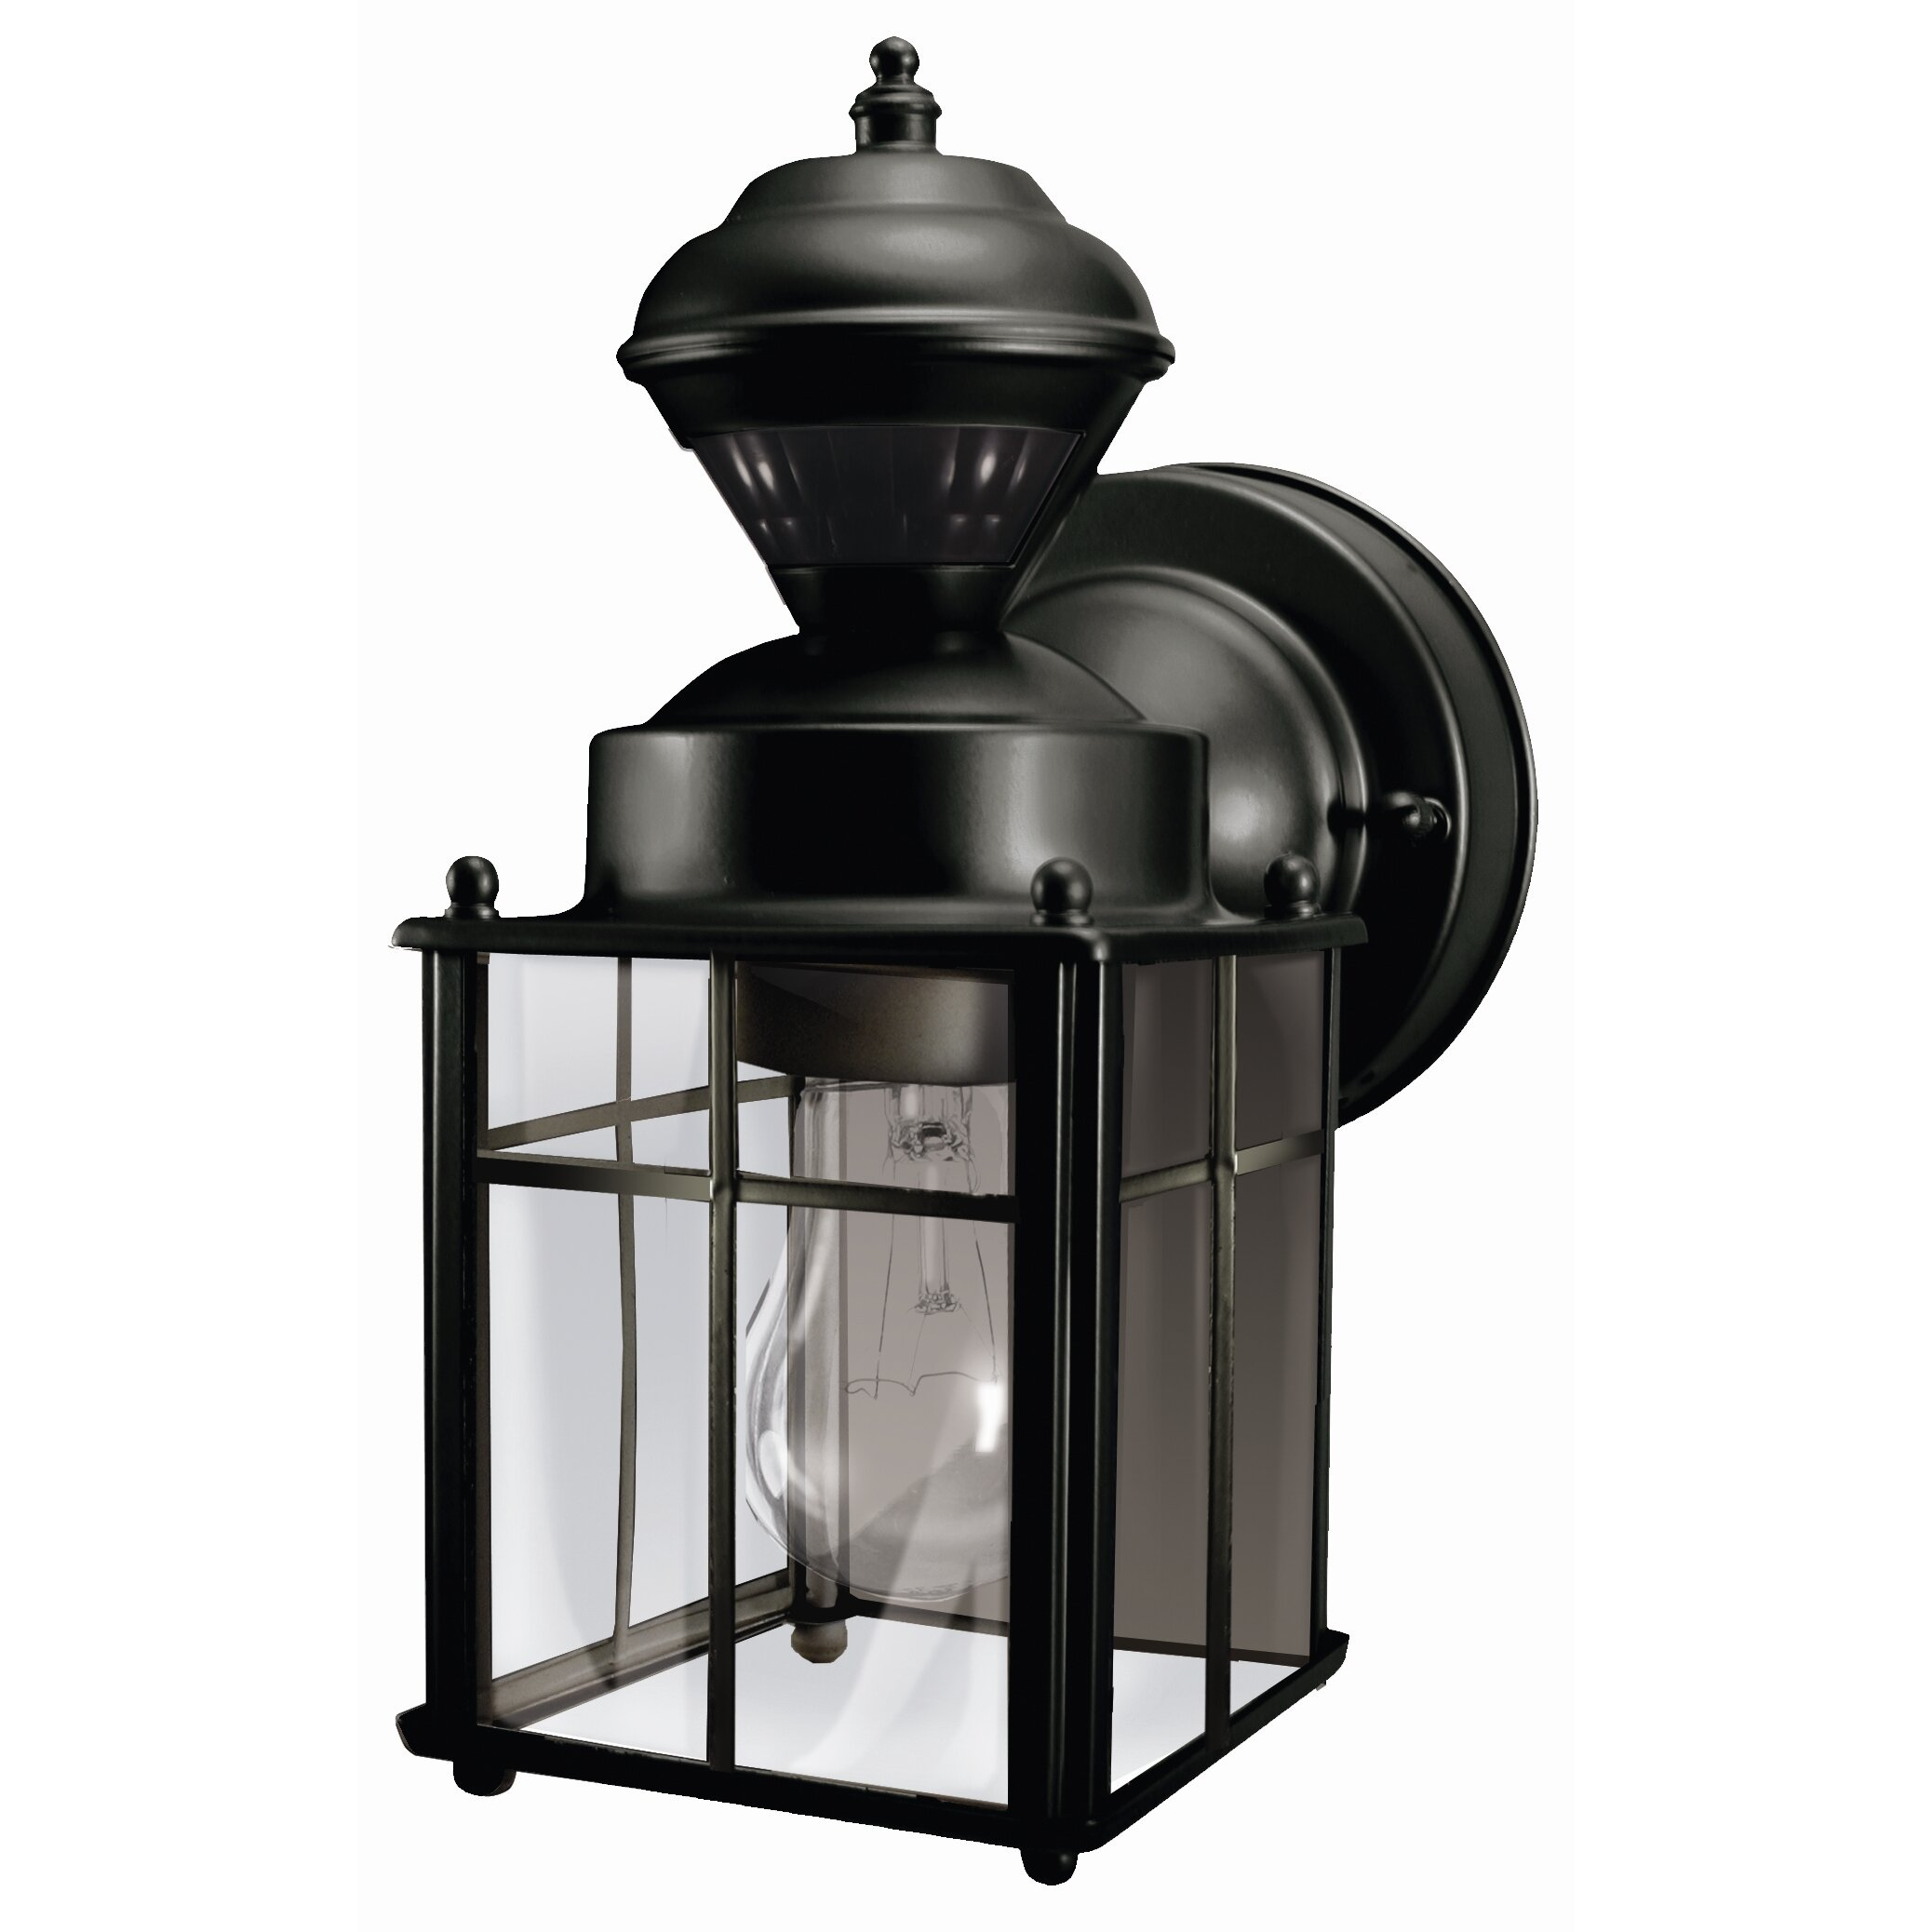 Heath zenith bayside 1 light outdoor wall lantern for Zenith garden rooms